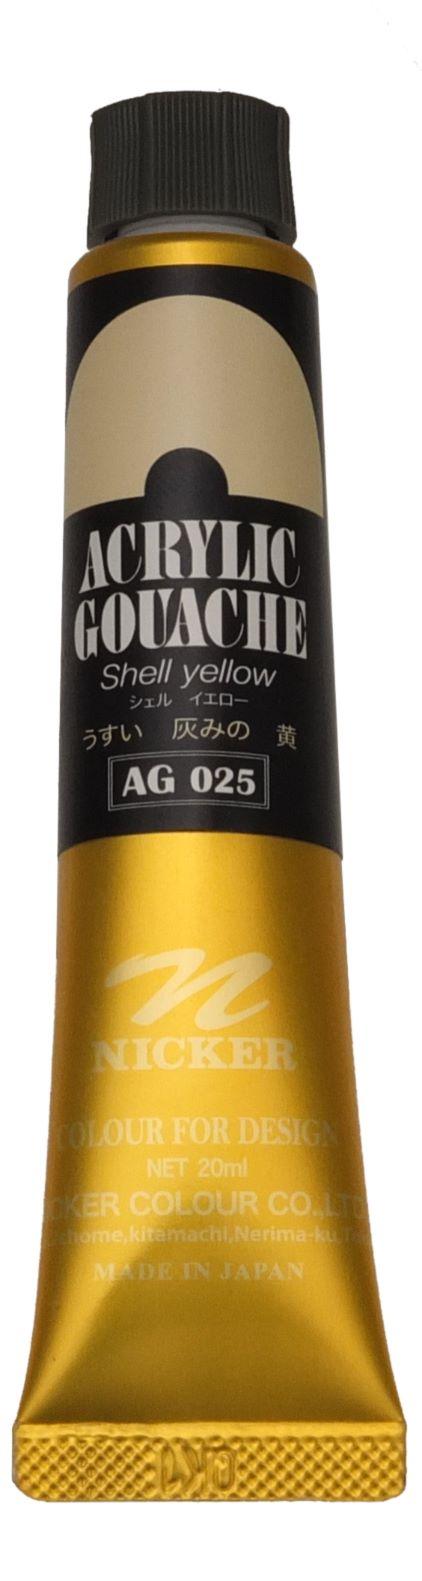 <Discontinued> ACRYLIC GOUACHE 20ml AG025 SHELL YELLOW